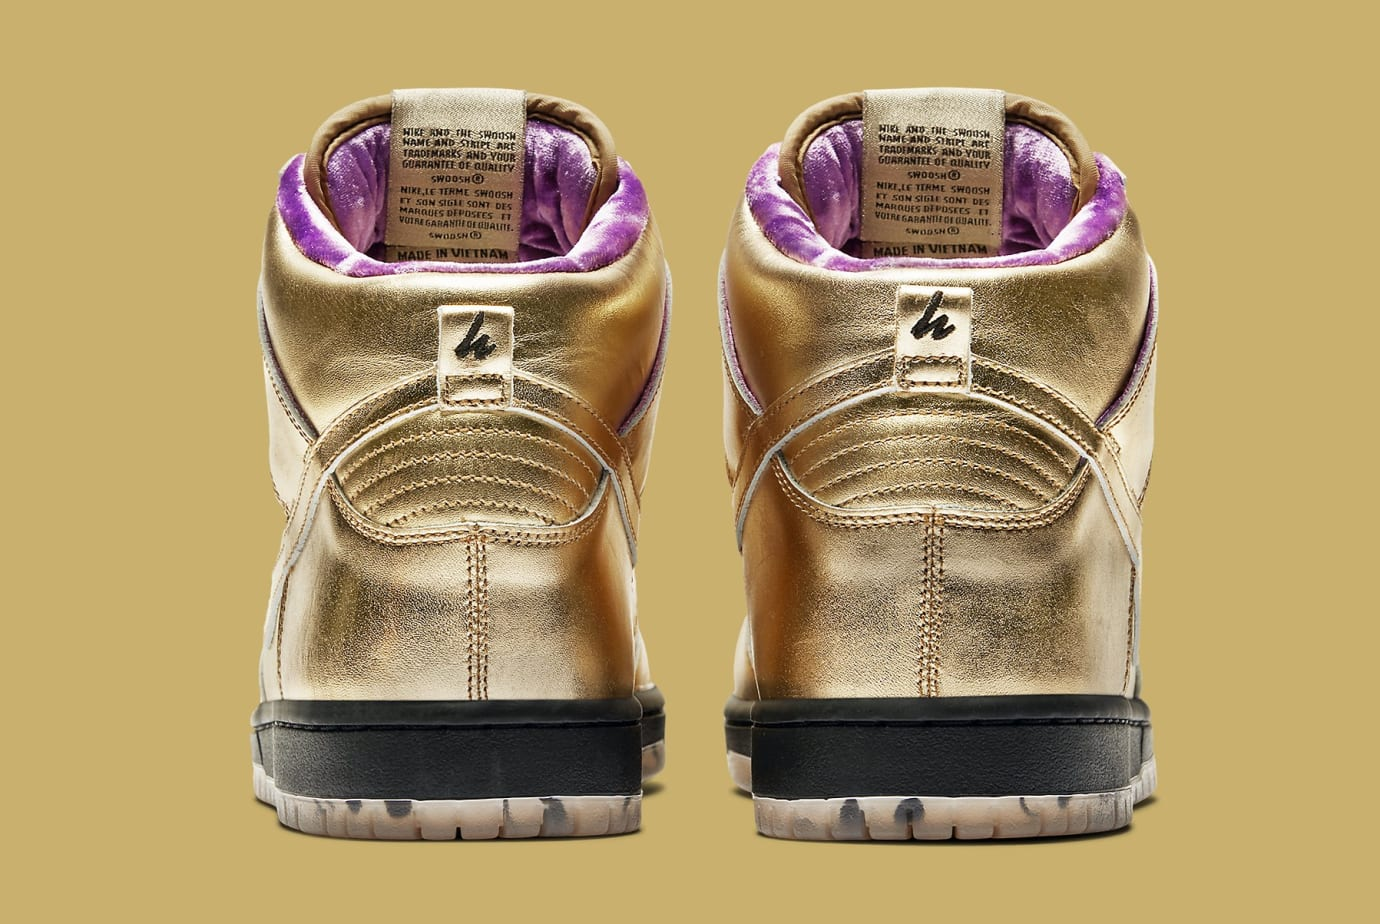 Humidity x Nike SB Dunk High Trumpet Tricentennial Release Date AV4168-776 Heel